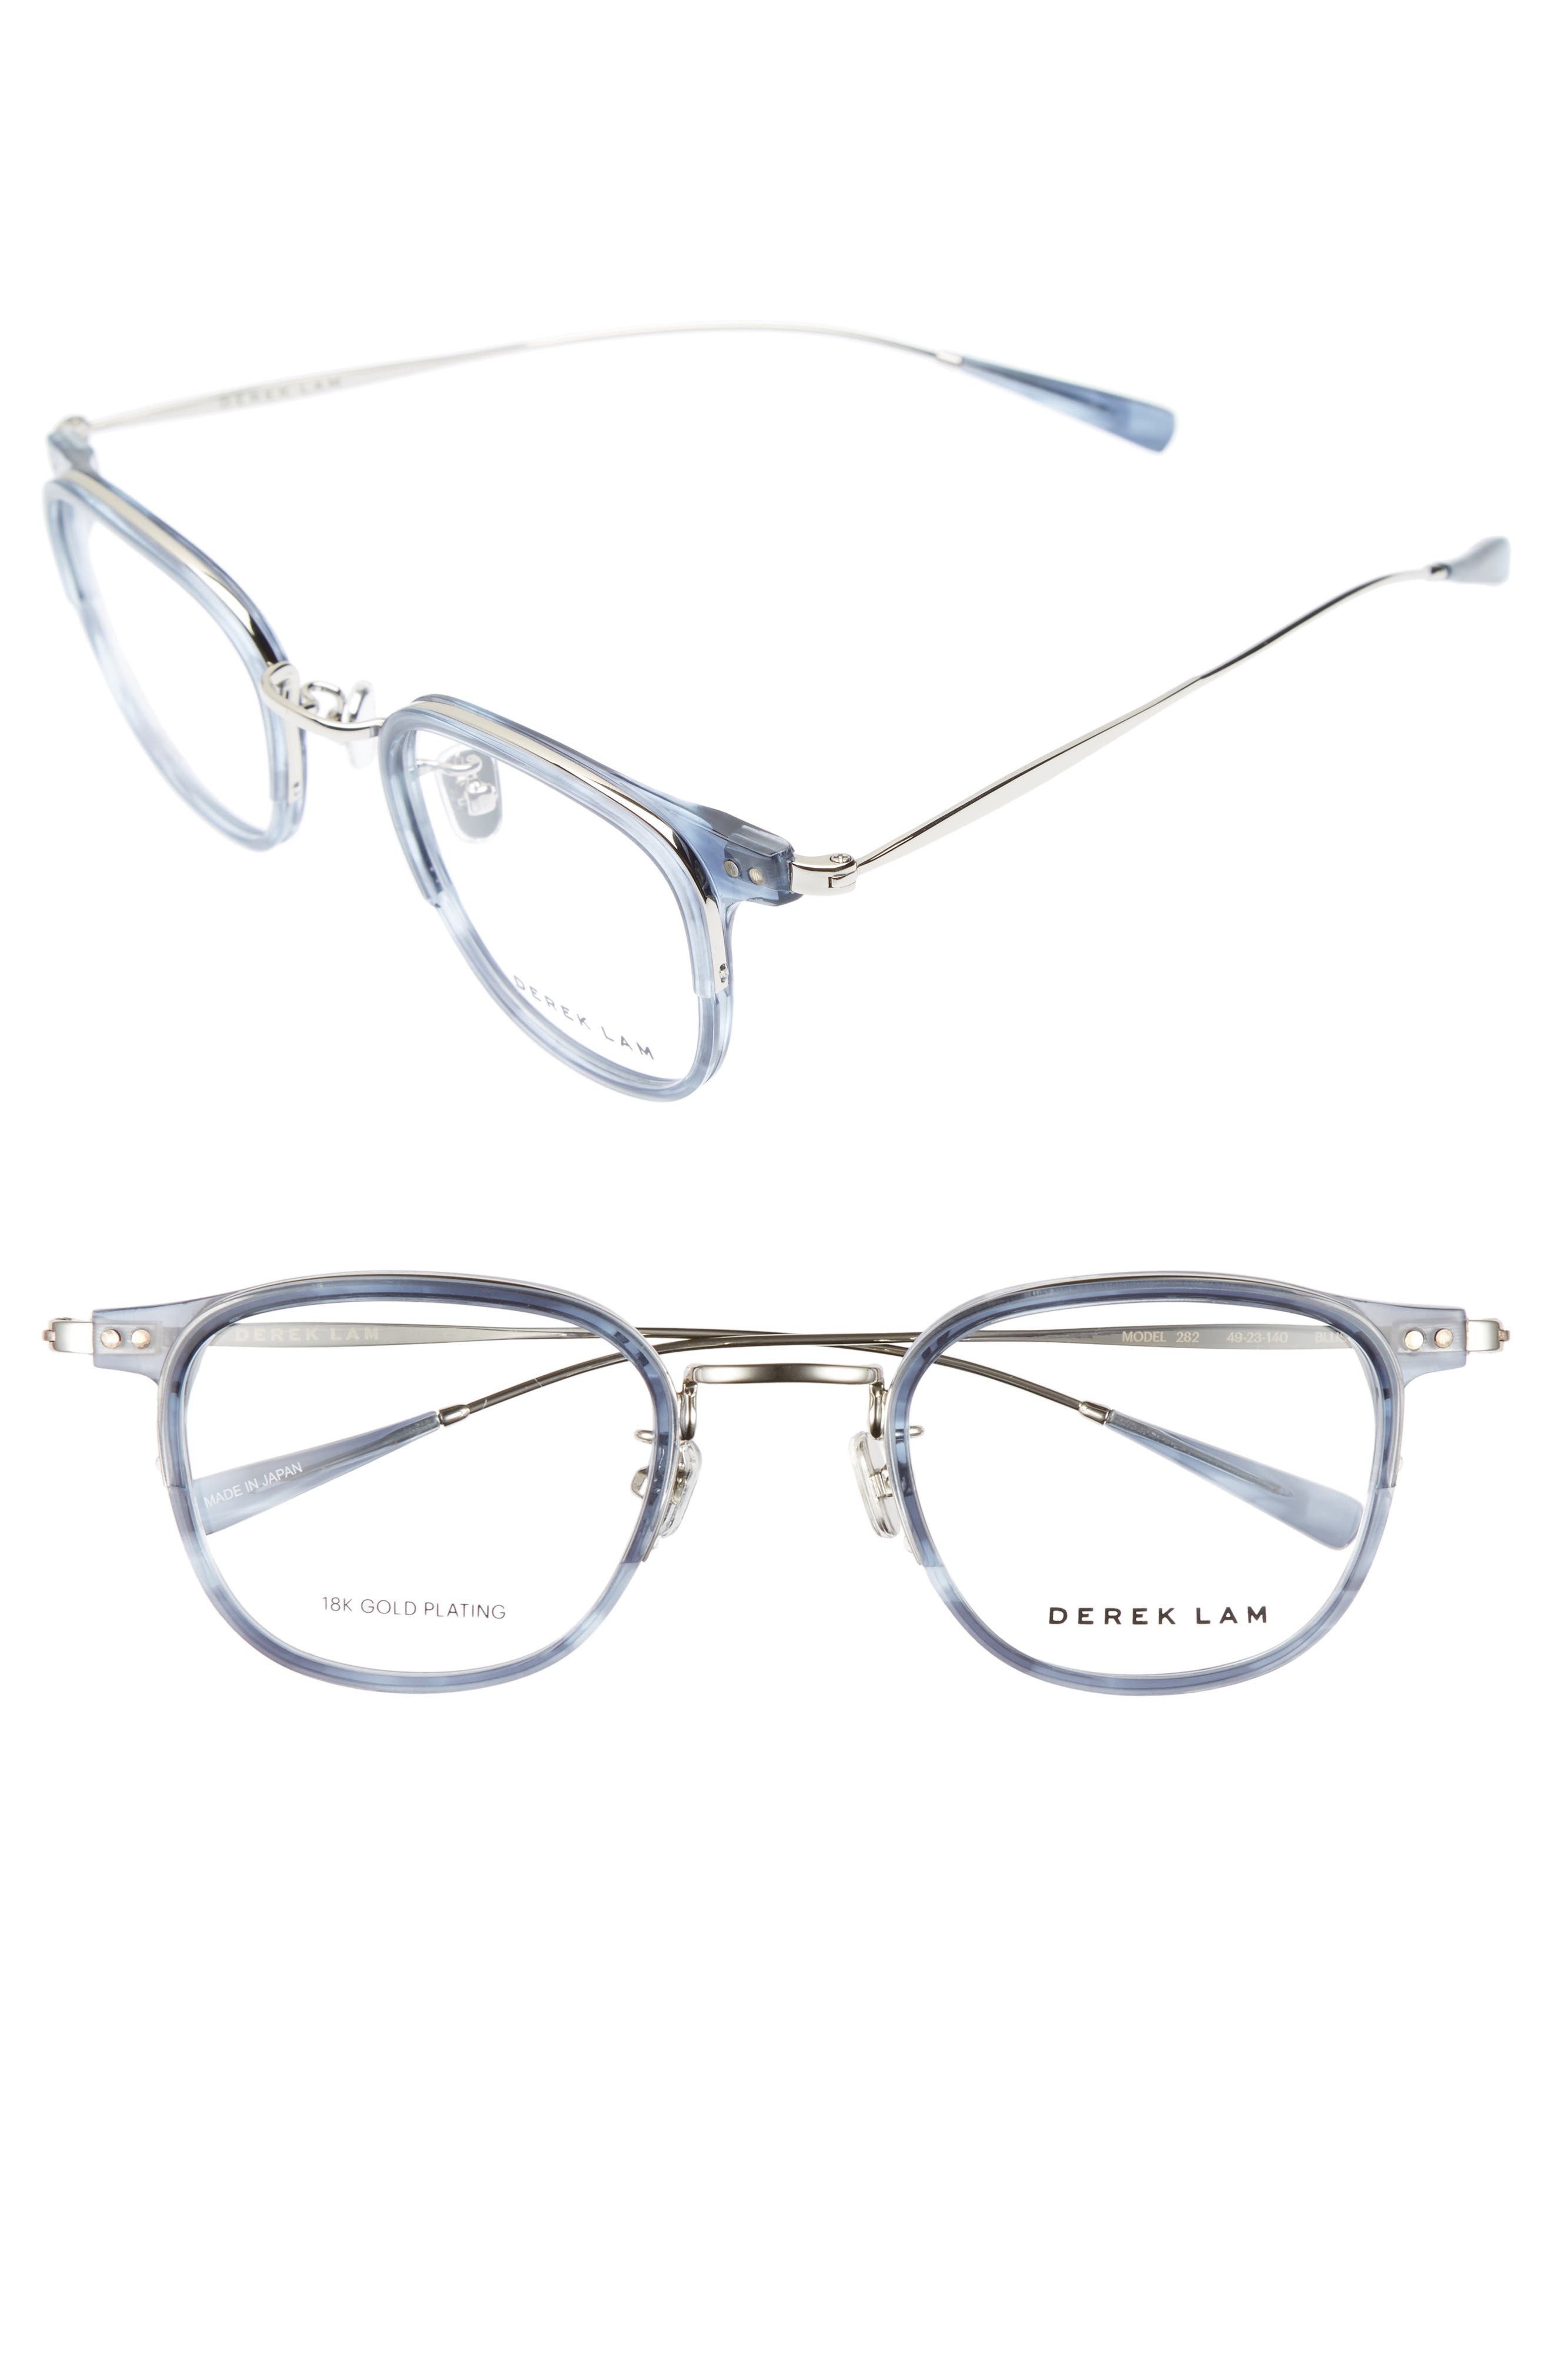 Derek Lam 49mm Optical Glasses